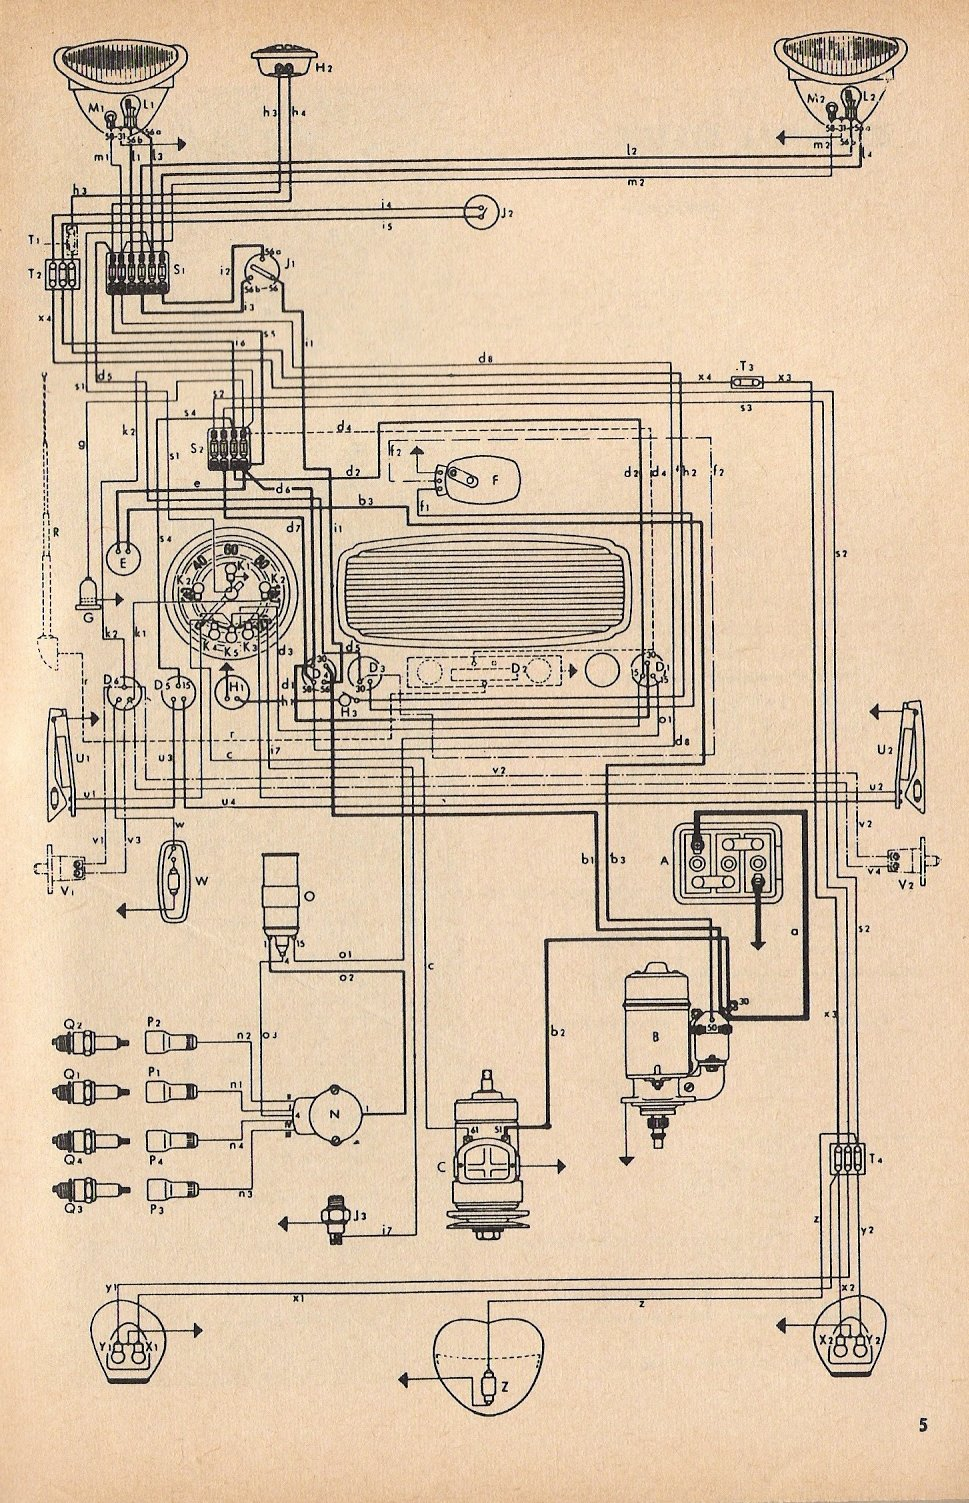 1970 vw beetle electrical wiring diagram